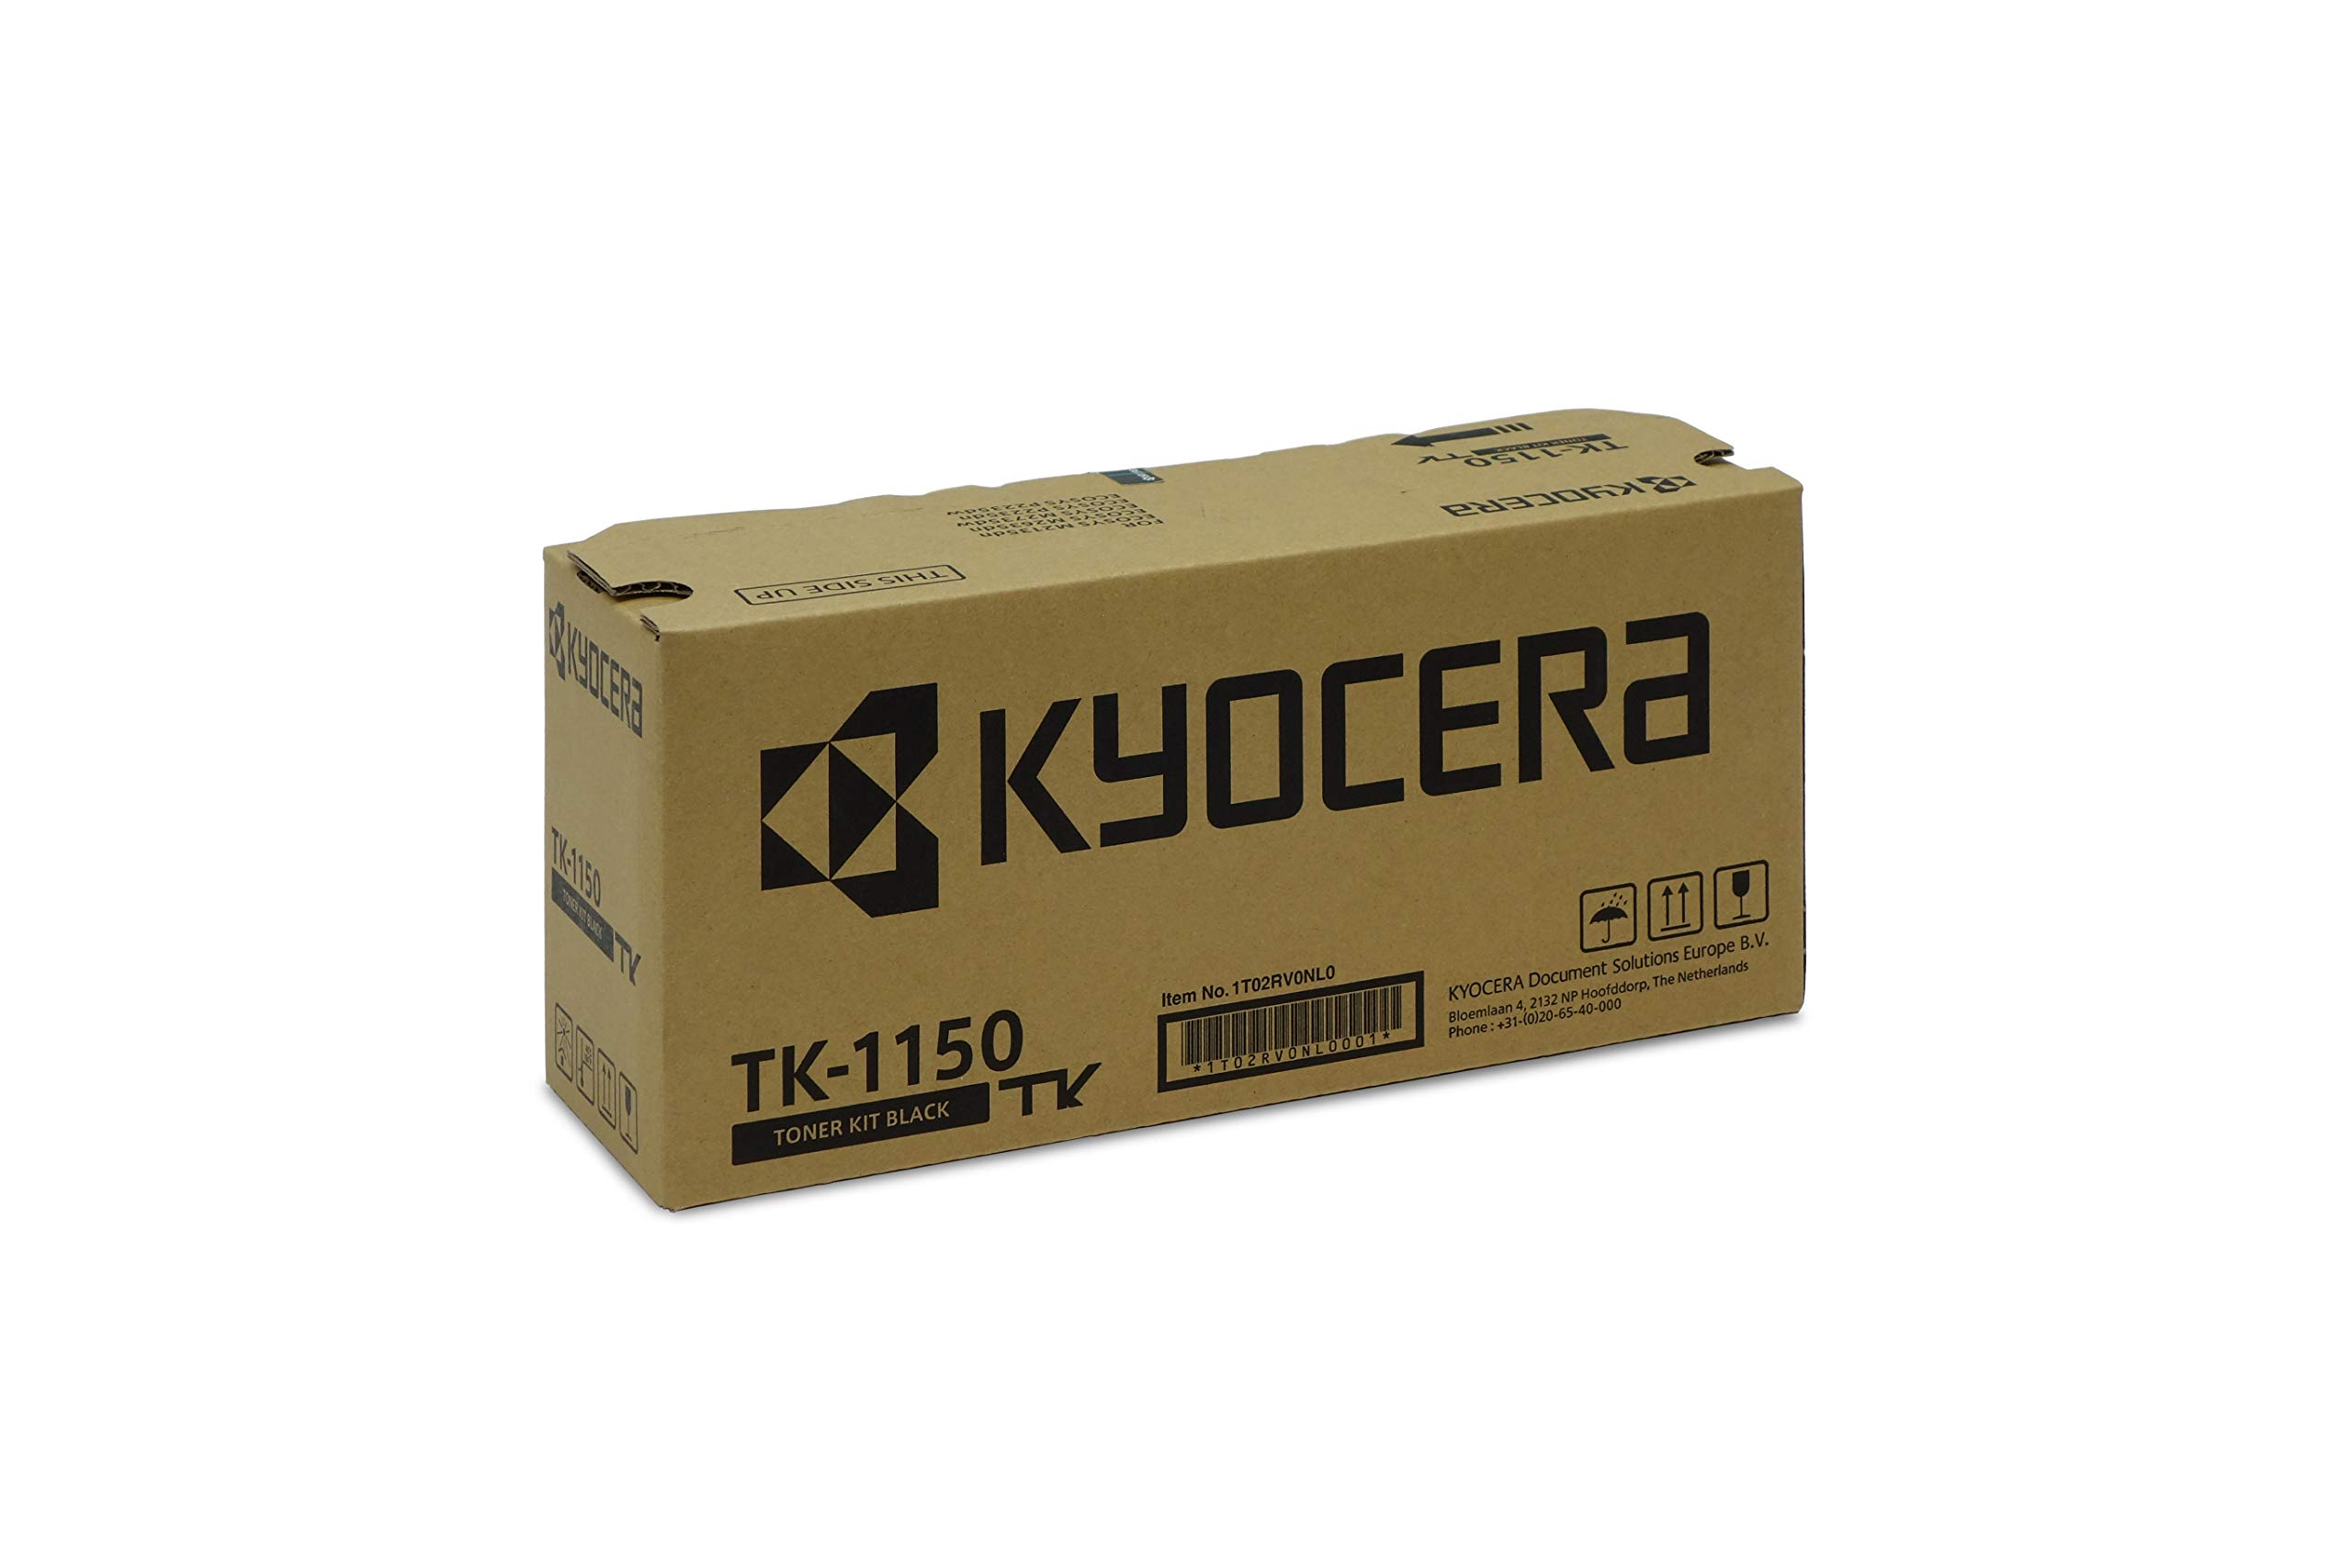 Kyocera-TK-1150-Original-Toner-Kartusche-Schwarz-1T02RV0NL0-Kompatibel-fr-ECOSYS-M2135dn-ECOSYS-M2635dn-ECOSYS-M2735dw-ECOSYS-P2235dn-ECOSYS-P2235dw